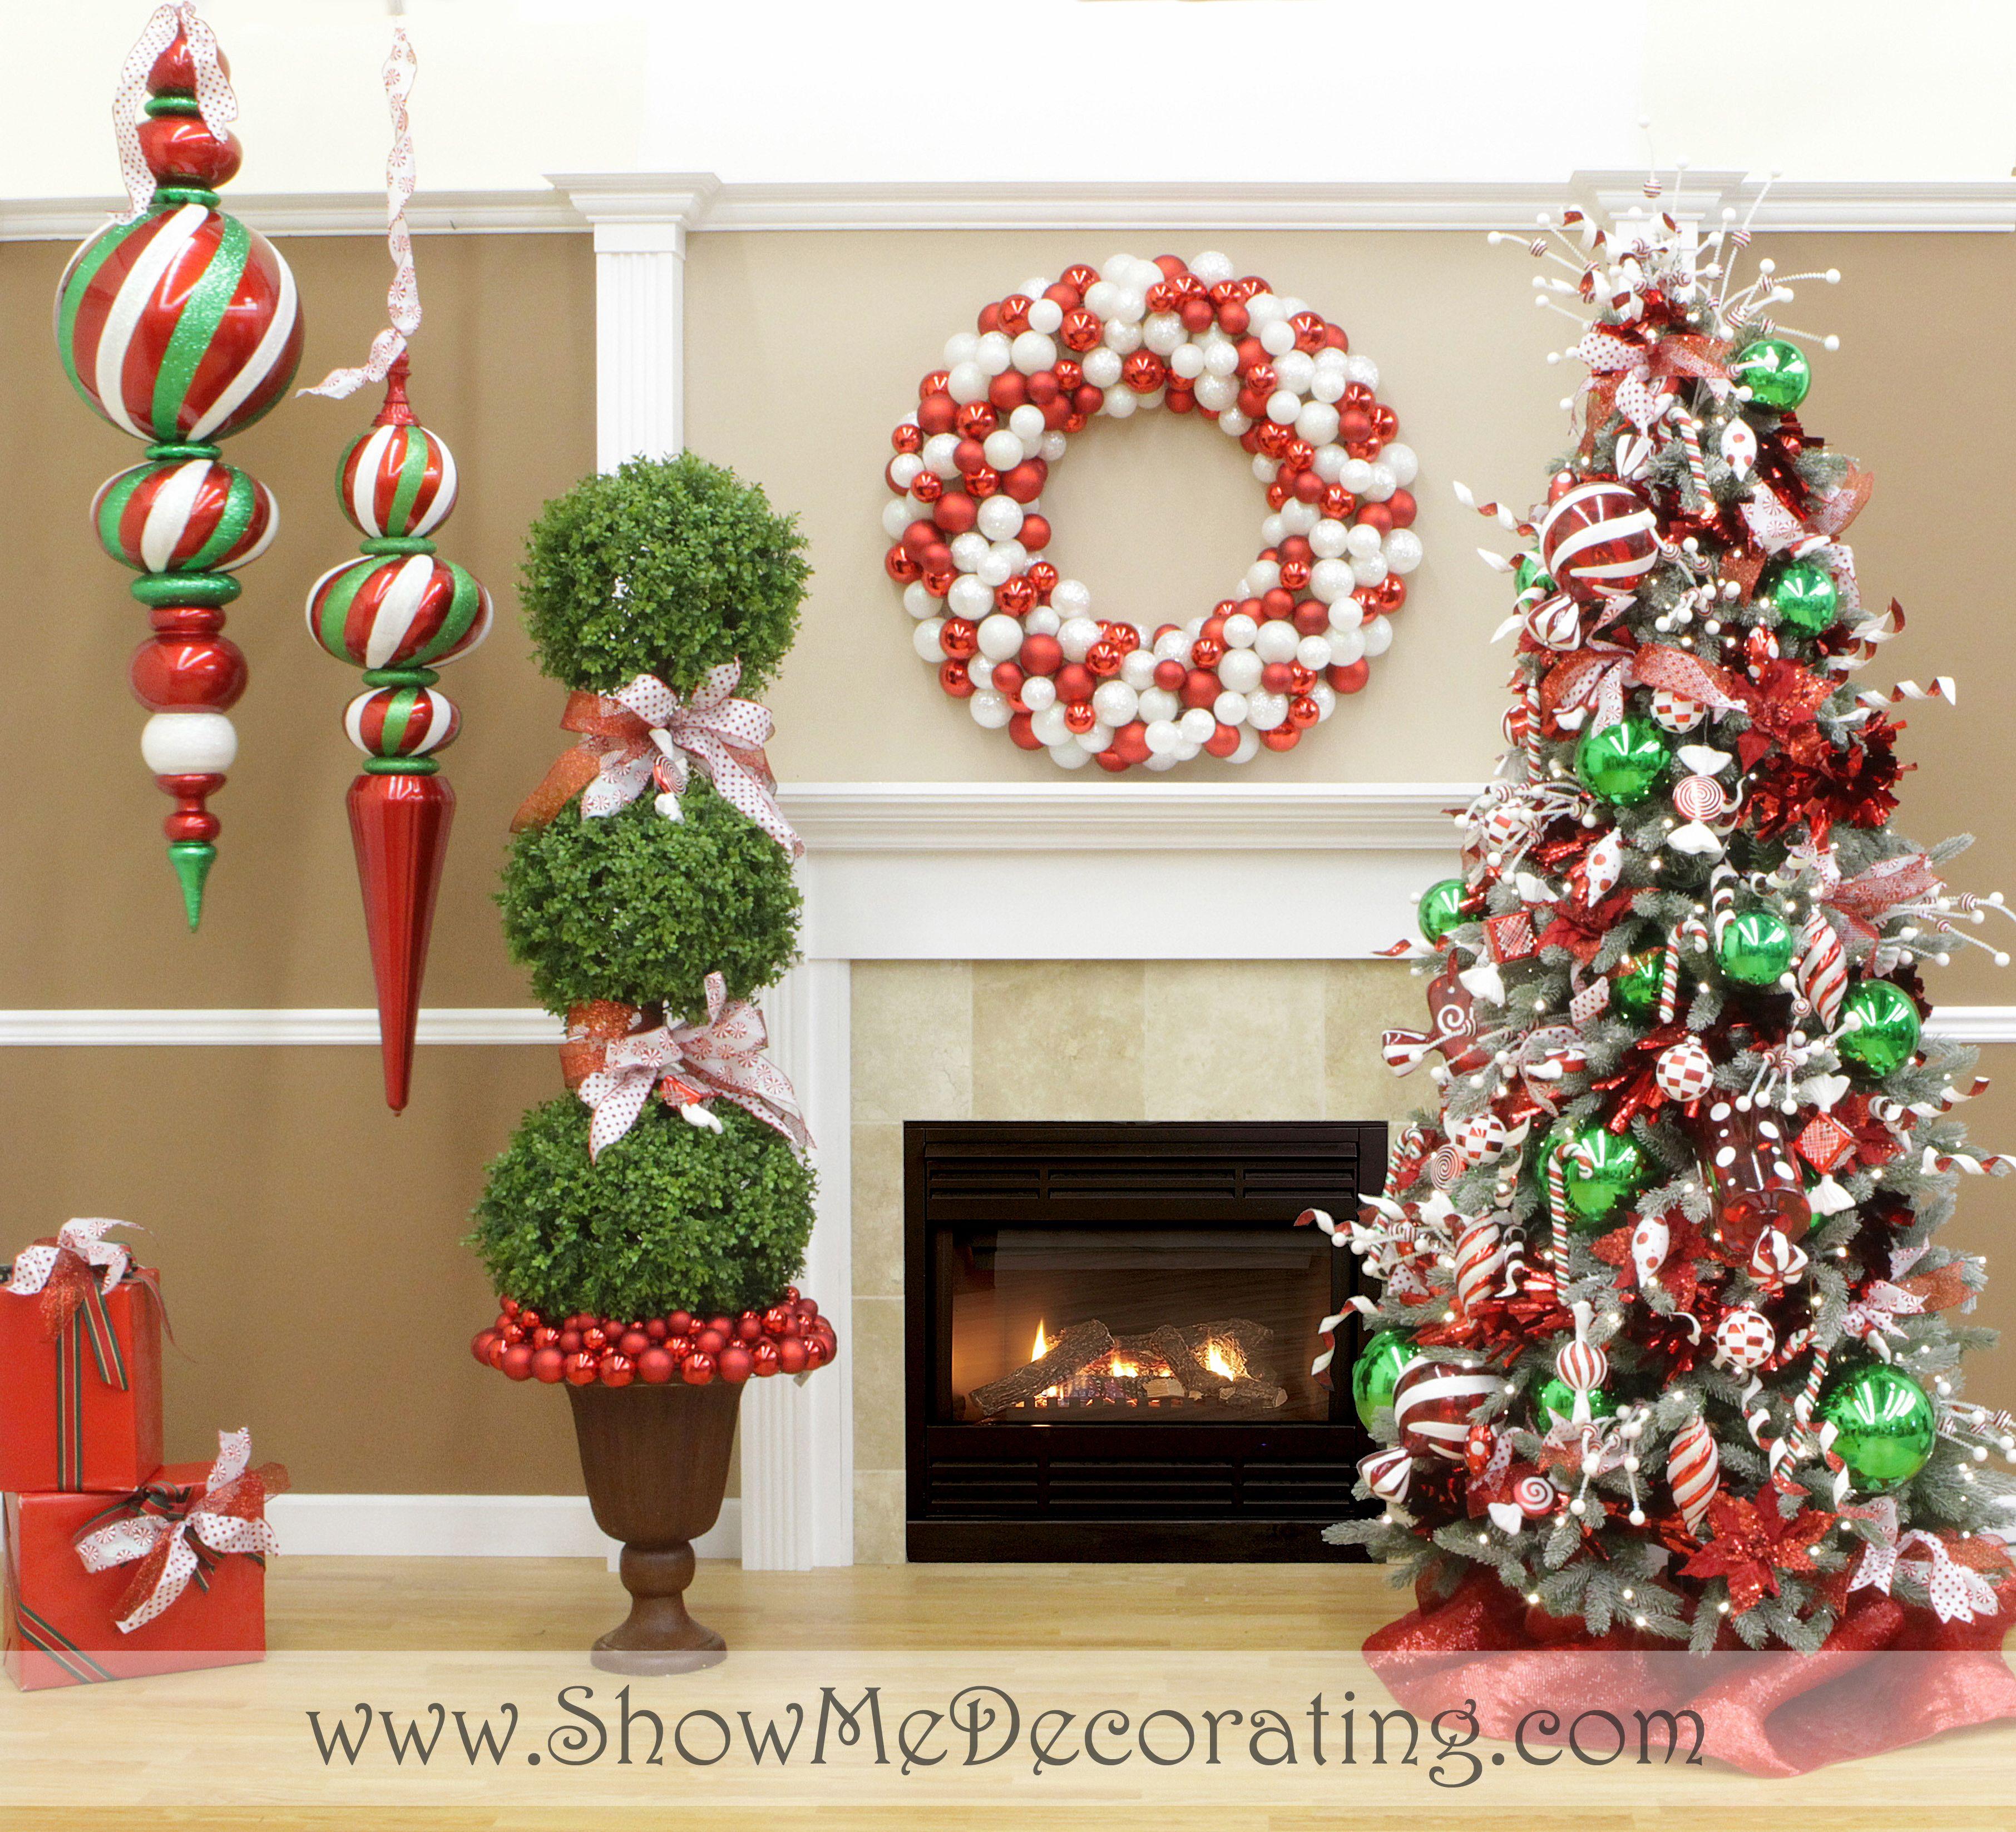 Show Me Decorating 2013 Christmas Tree Themes Inspiration and DIY